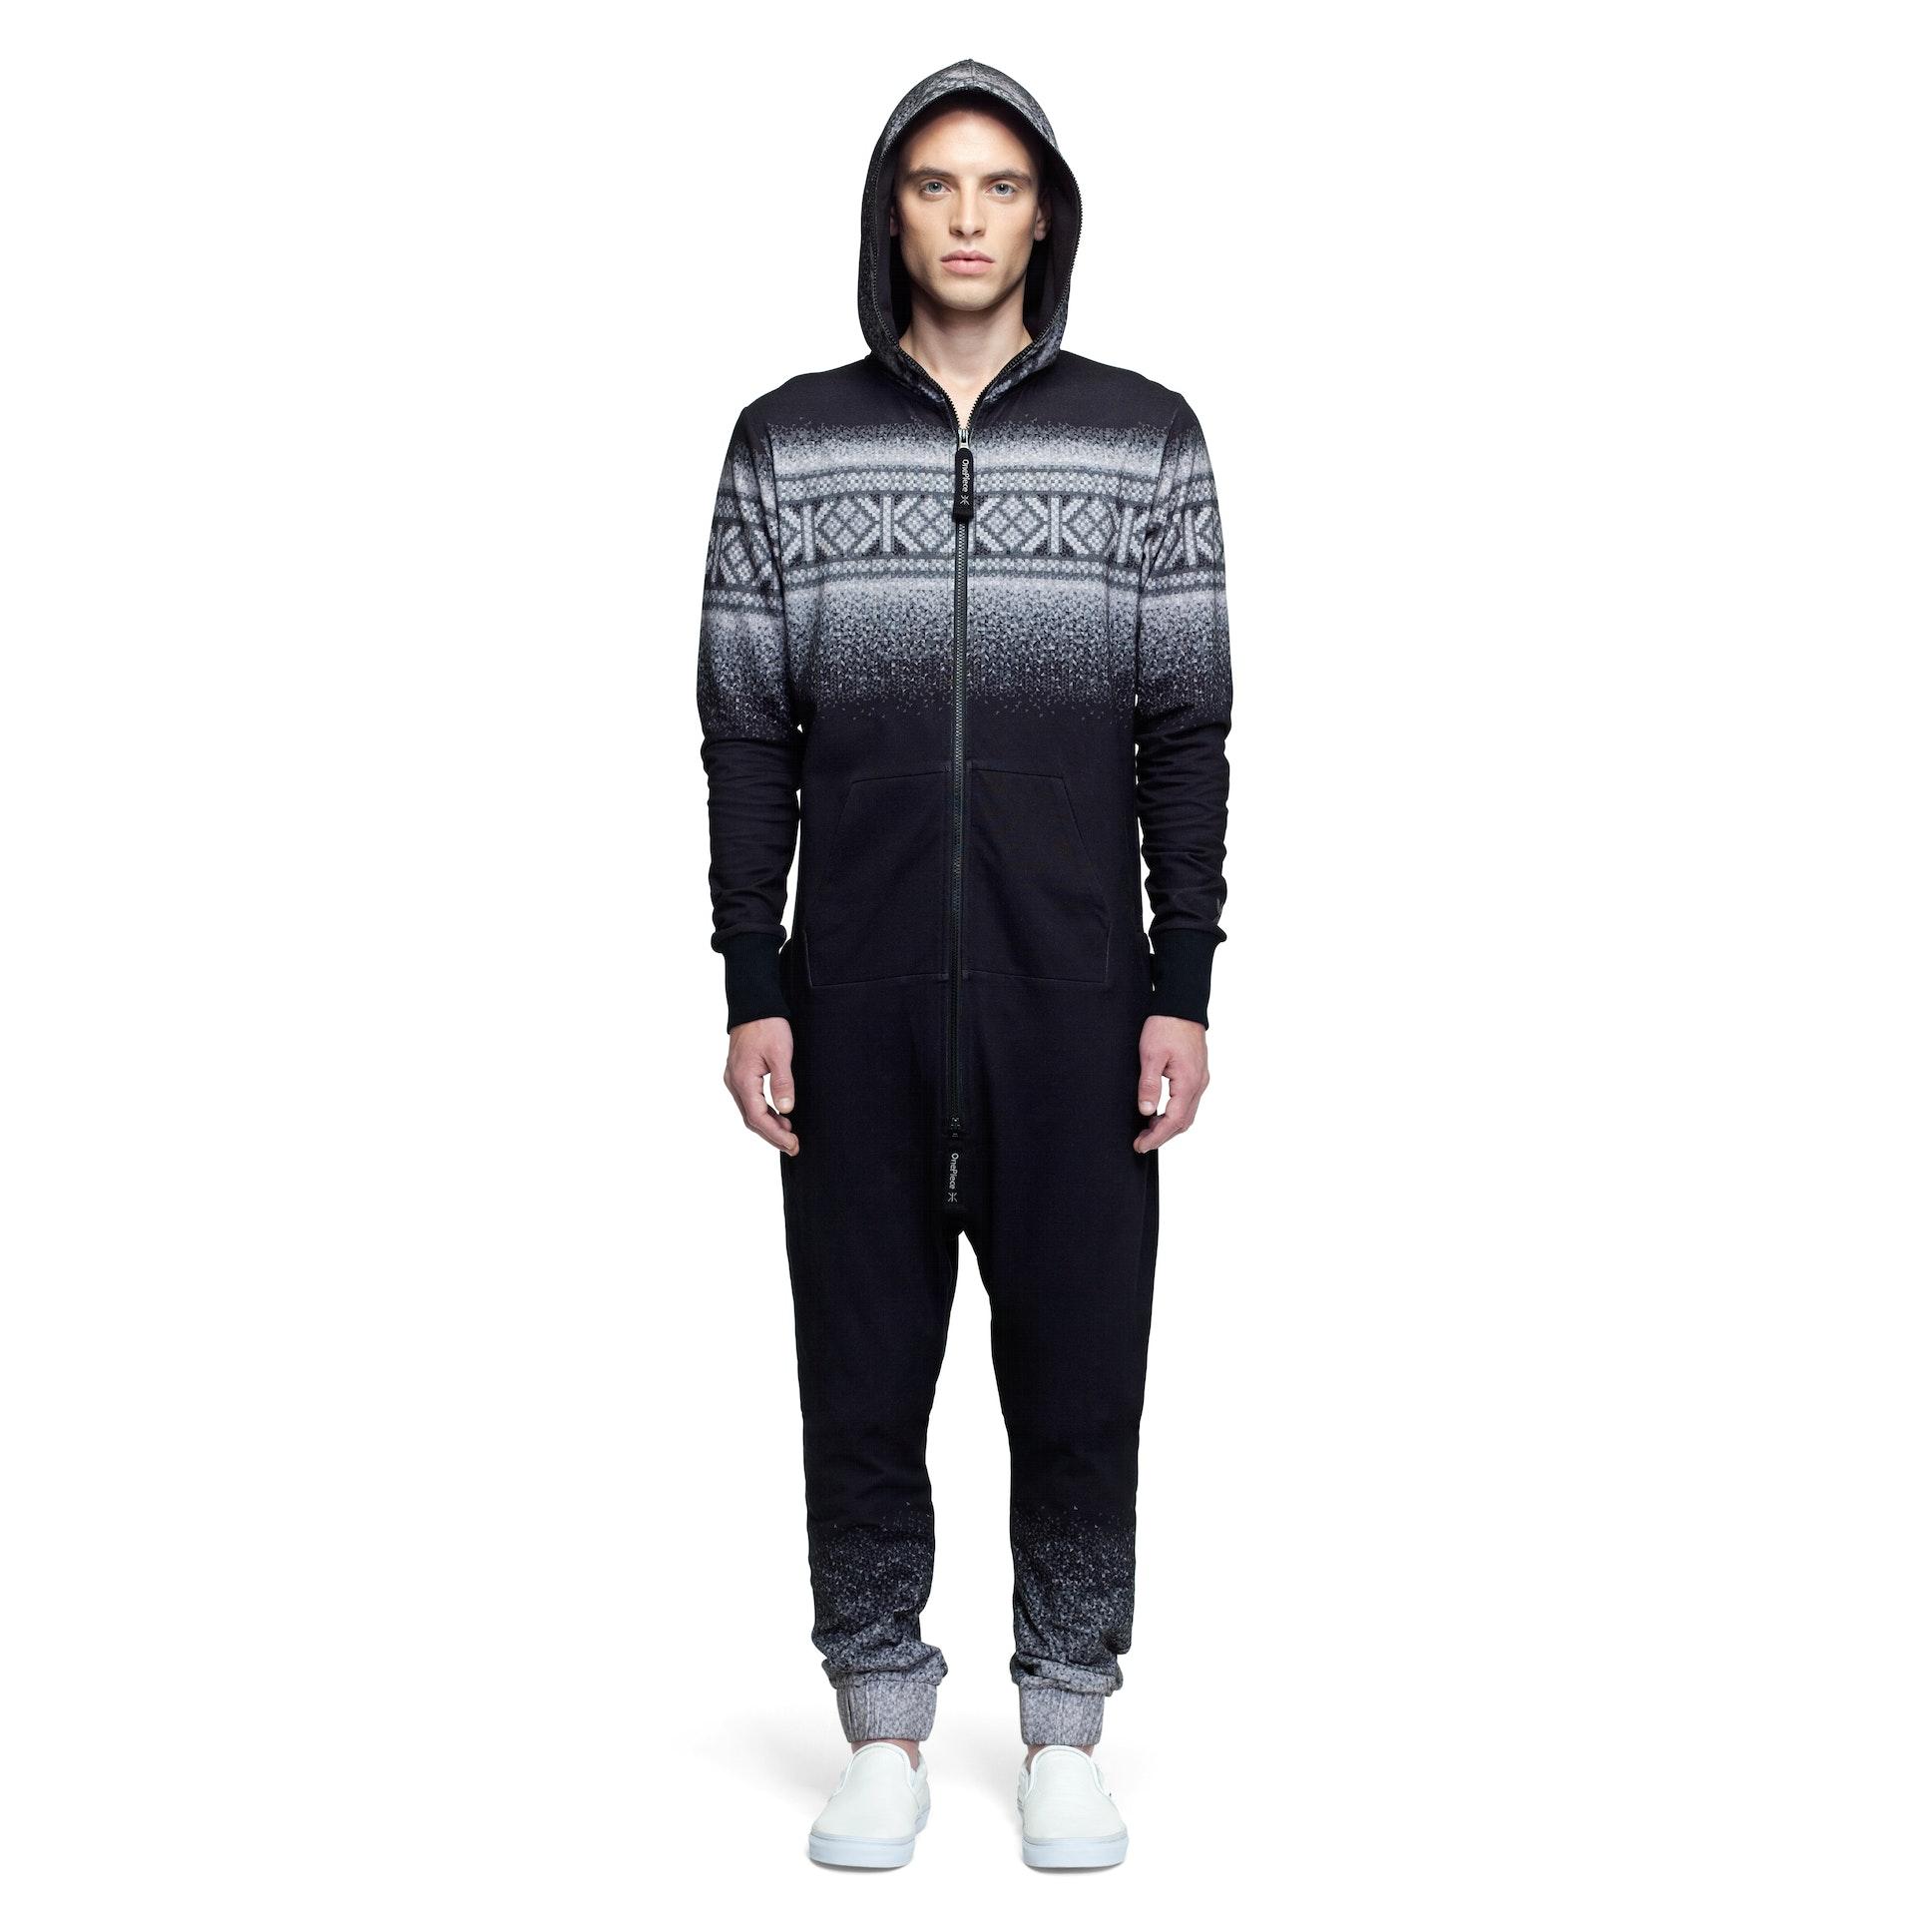 digital jumpsuit noir combinaison onesie onepiece fr. Black Bedroom Furniture Sets. Home Design Ideas